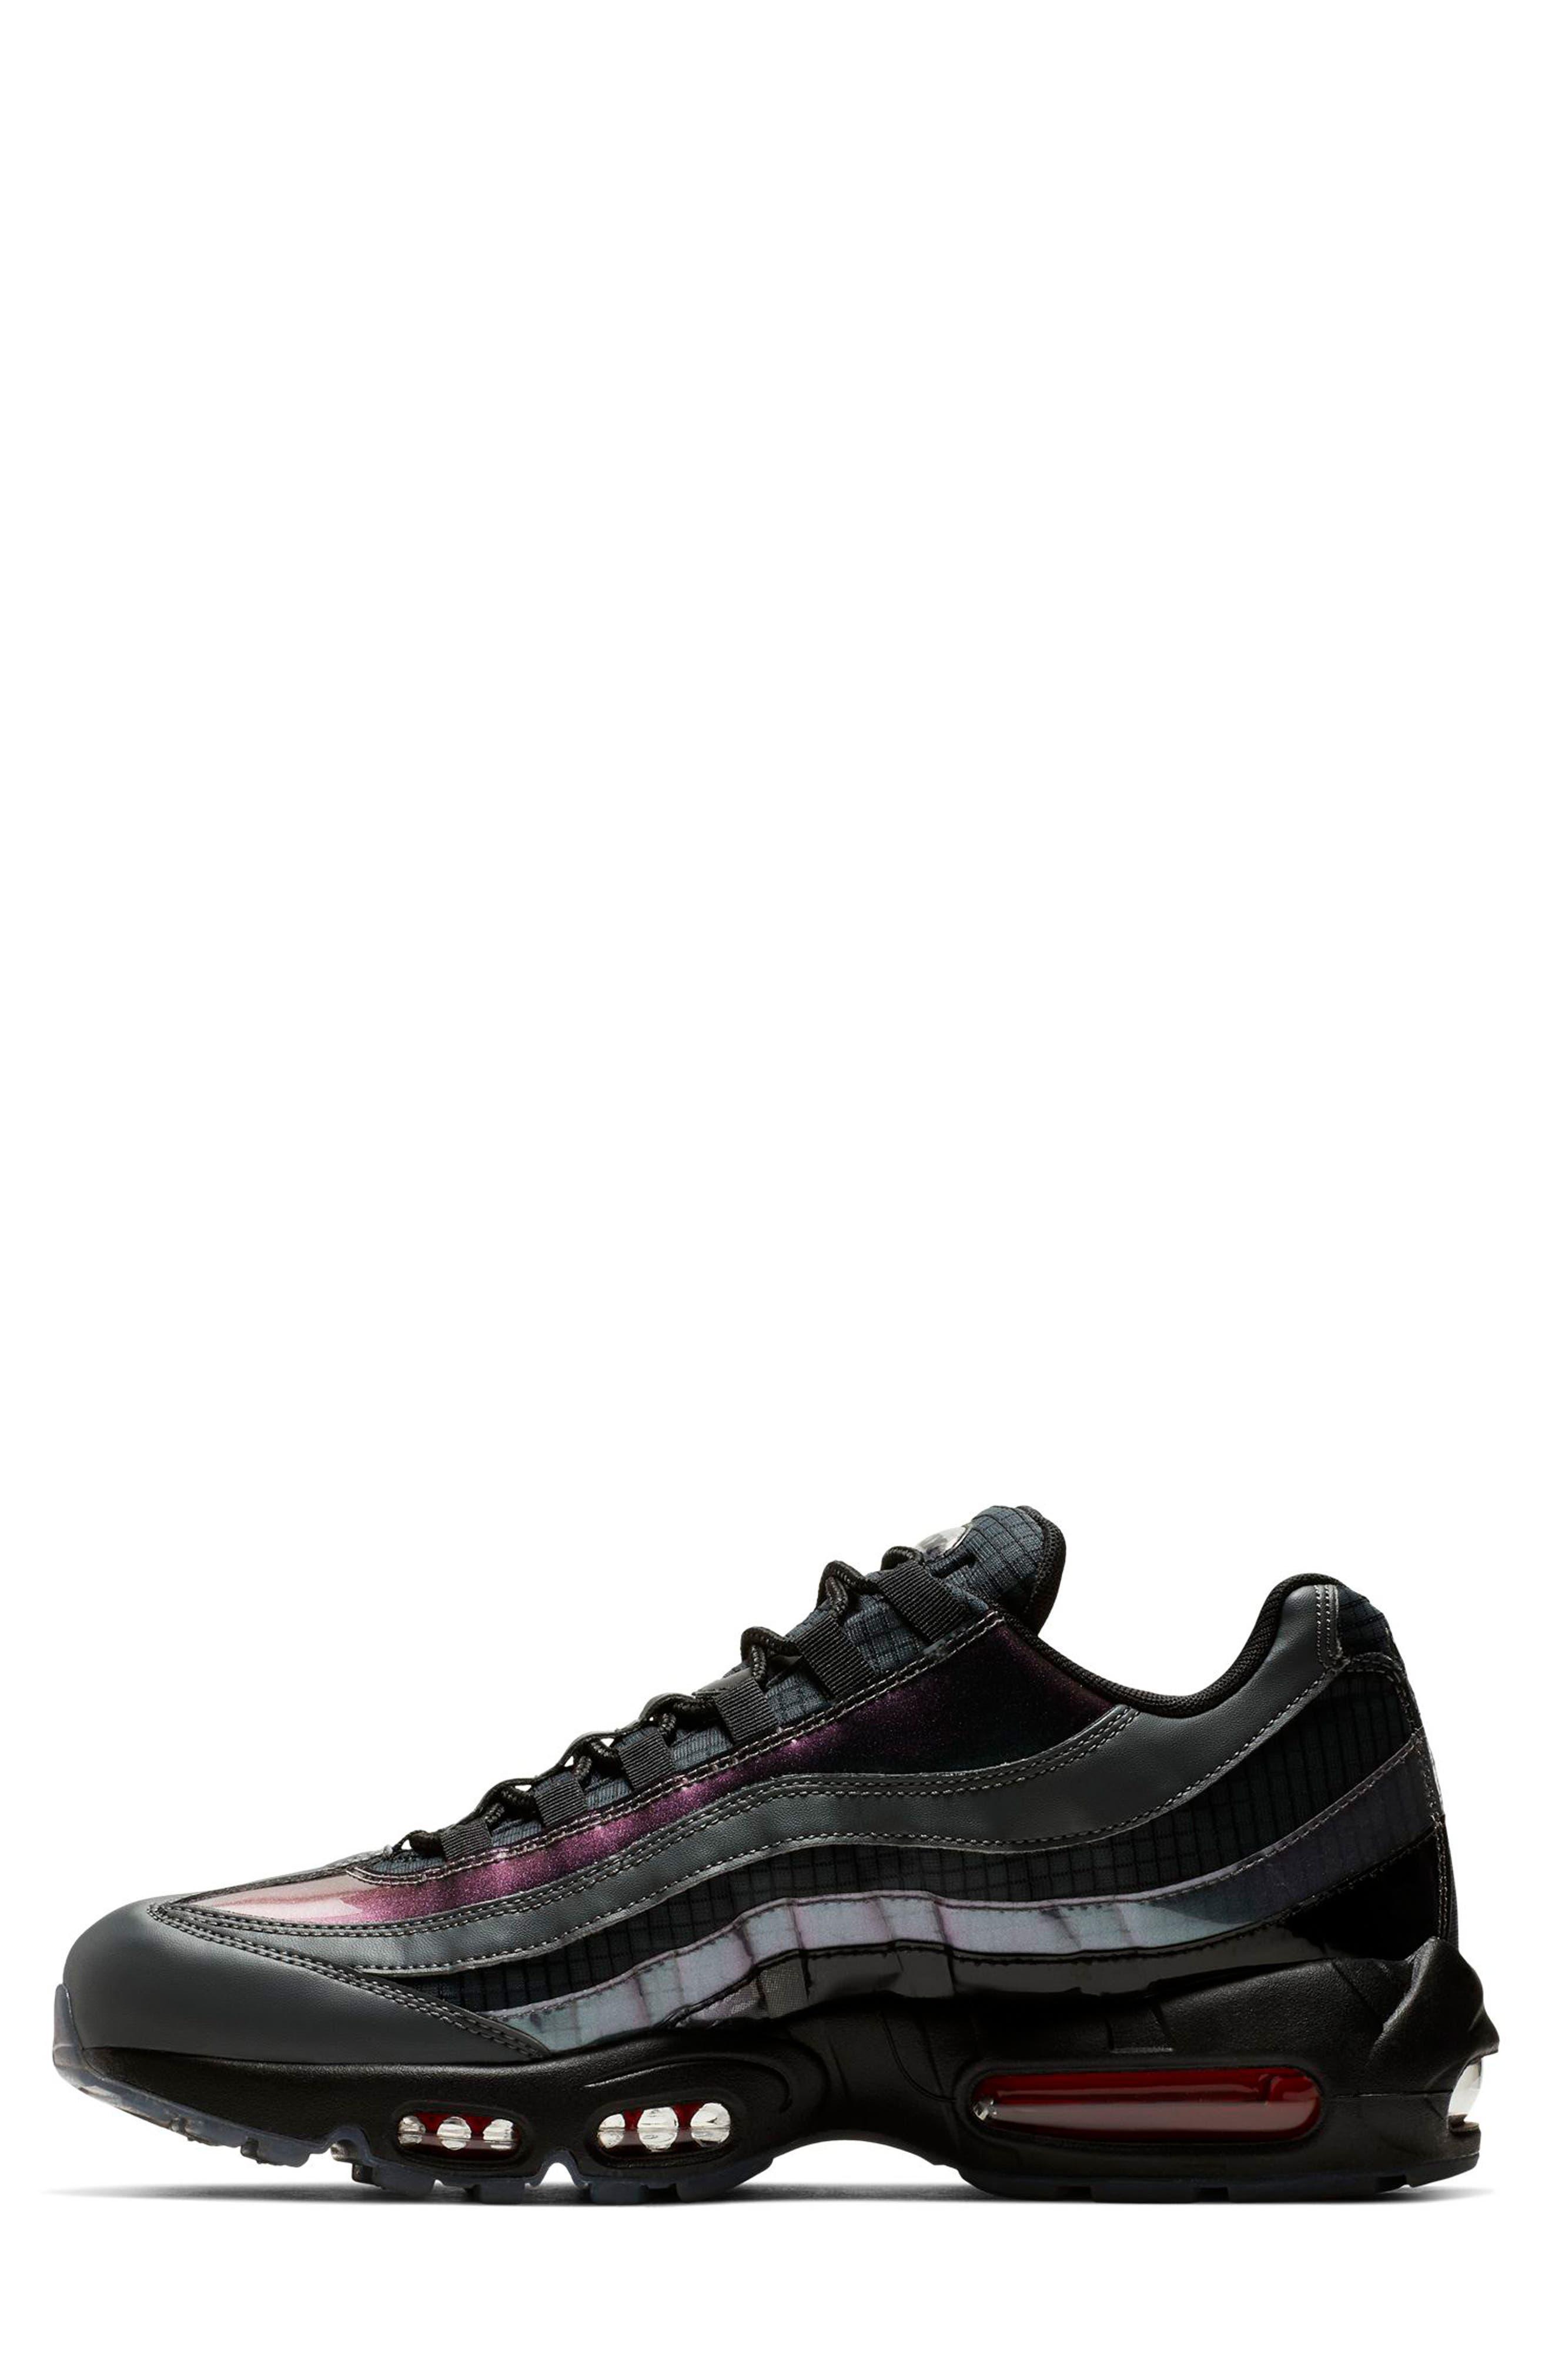 Air Max 95 LV8 Sneaker,                             Alternate thumbnail 3, color,                             001